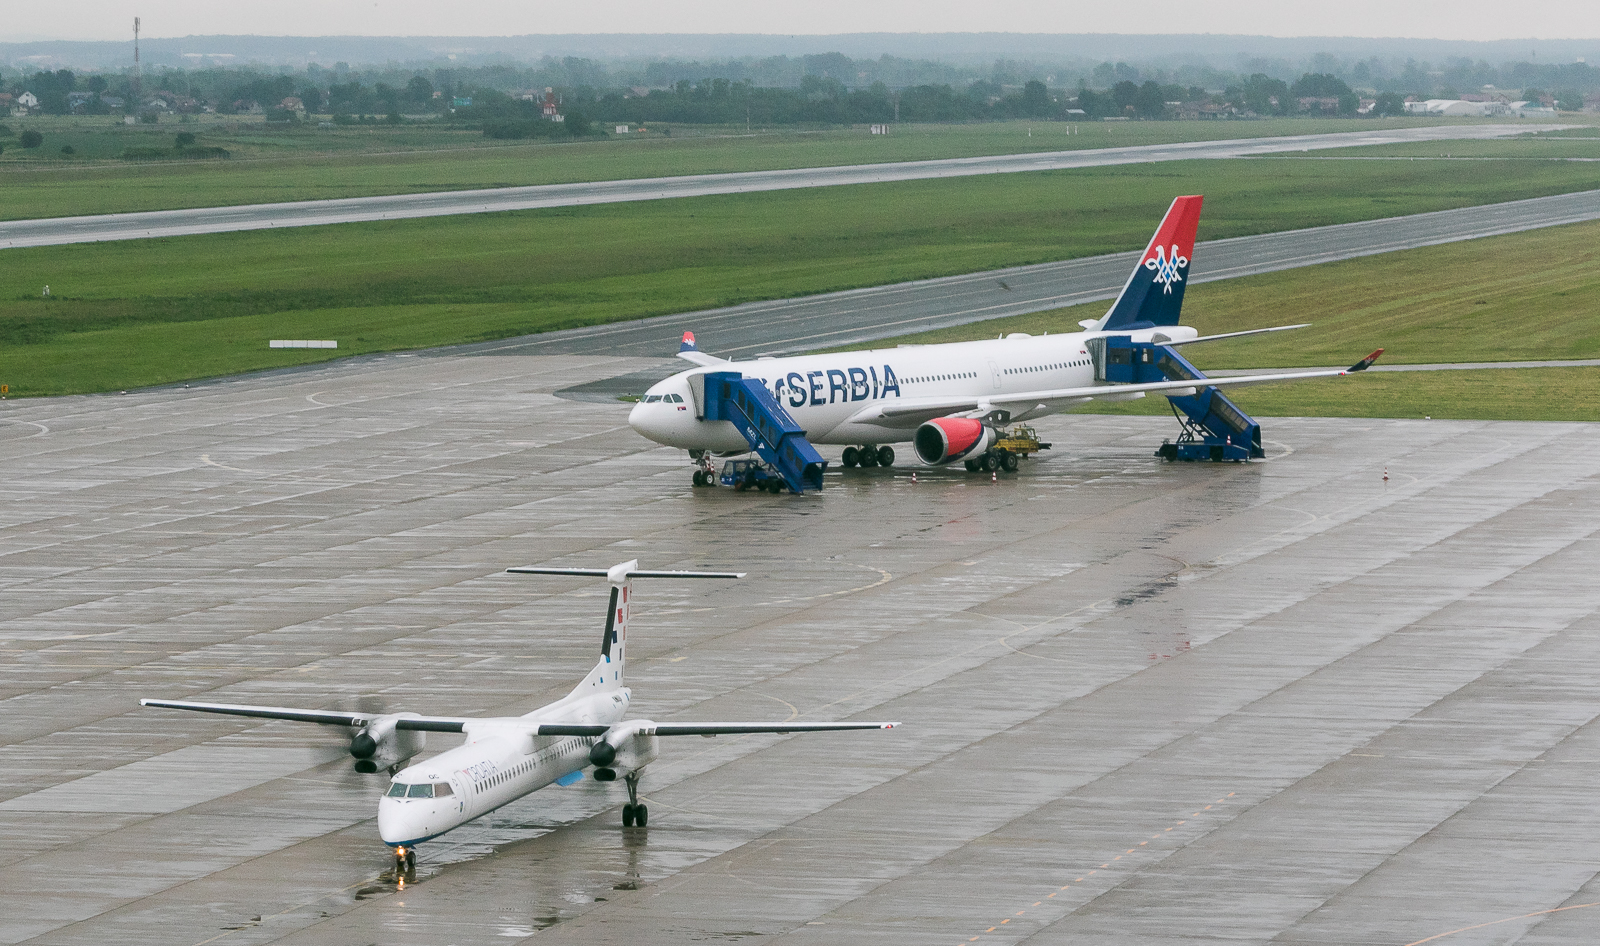 Let do Plesa trajao je 30ak minuta. YU-ARA parkiran je na deo platforme rezervisan za širokotrupne avione / Foto: Dragan Trifunović